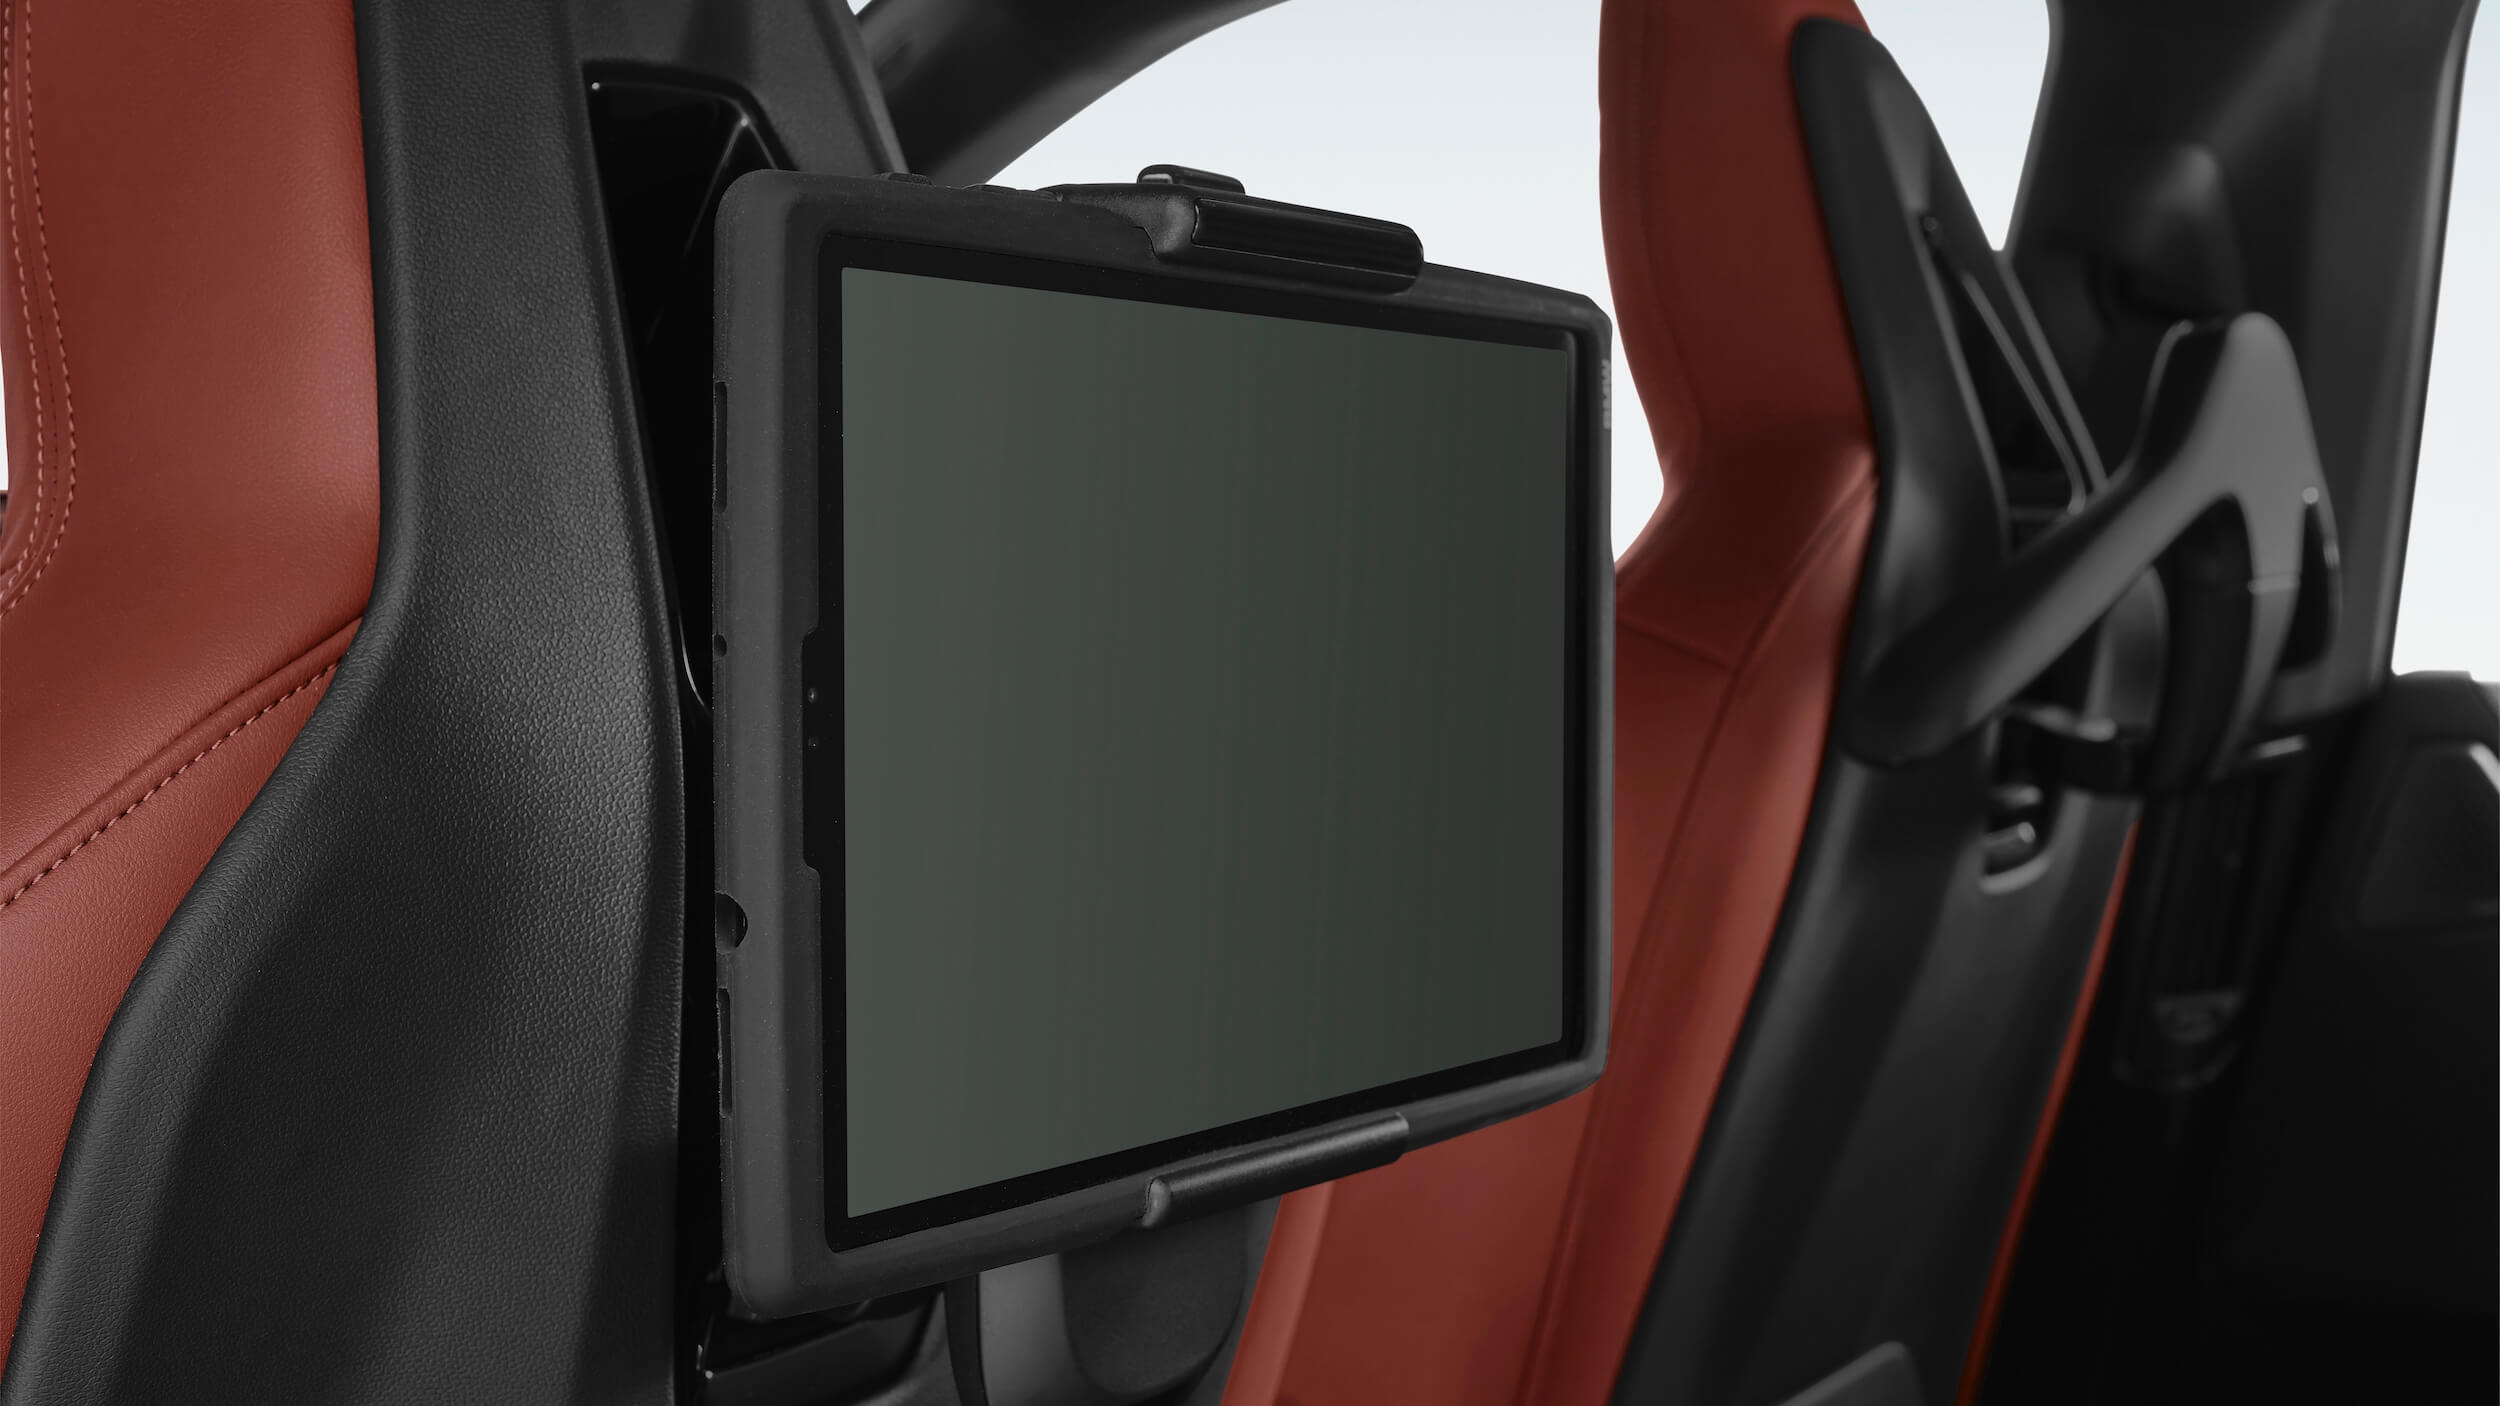 BMW iX scherm achter zetels